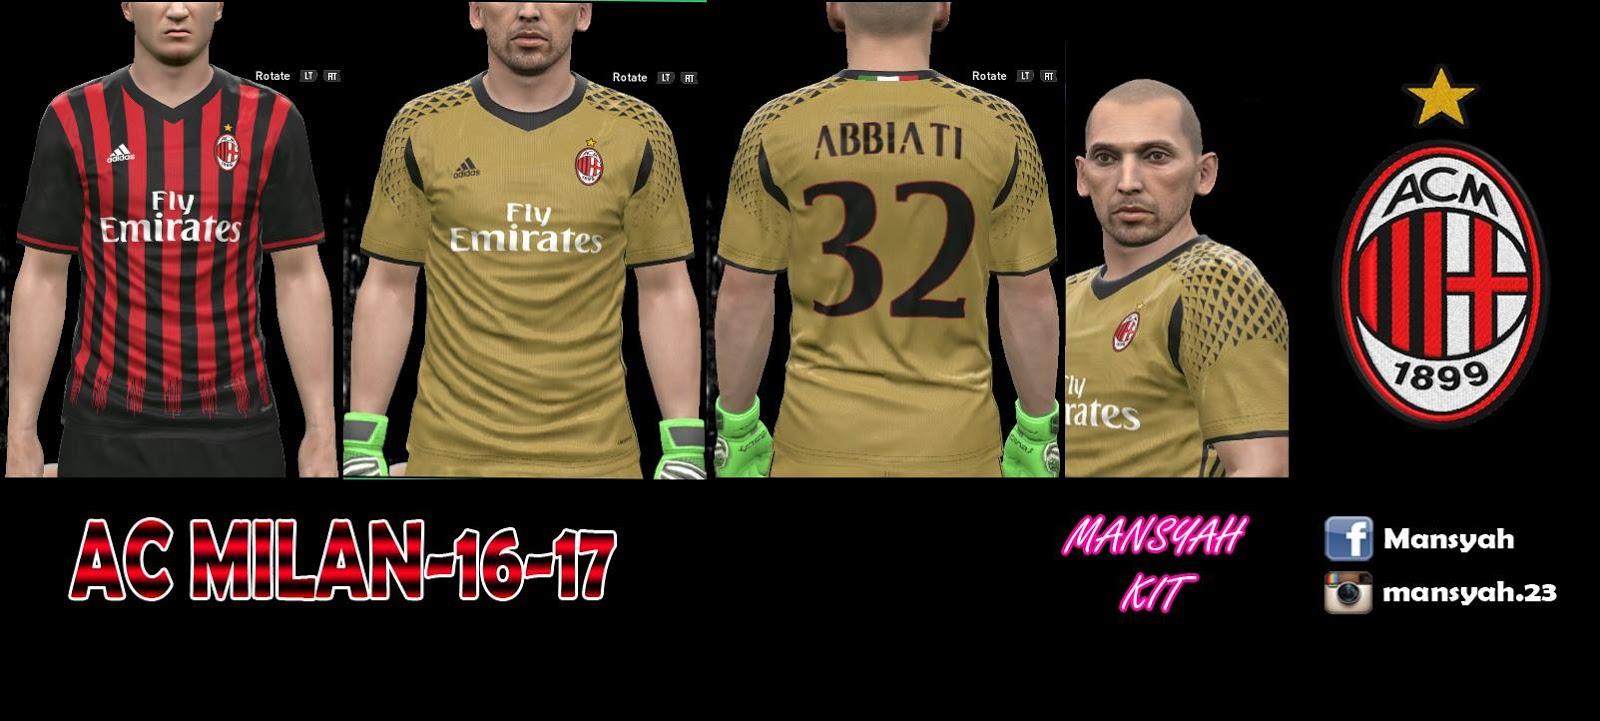 PES-MODIF: PES 2016 AC Milan 16-17 Kits By Mansyah